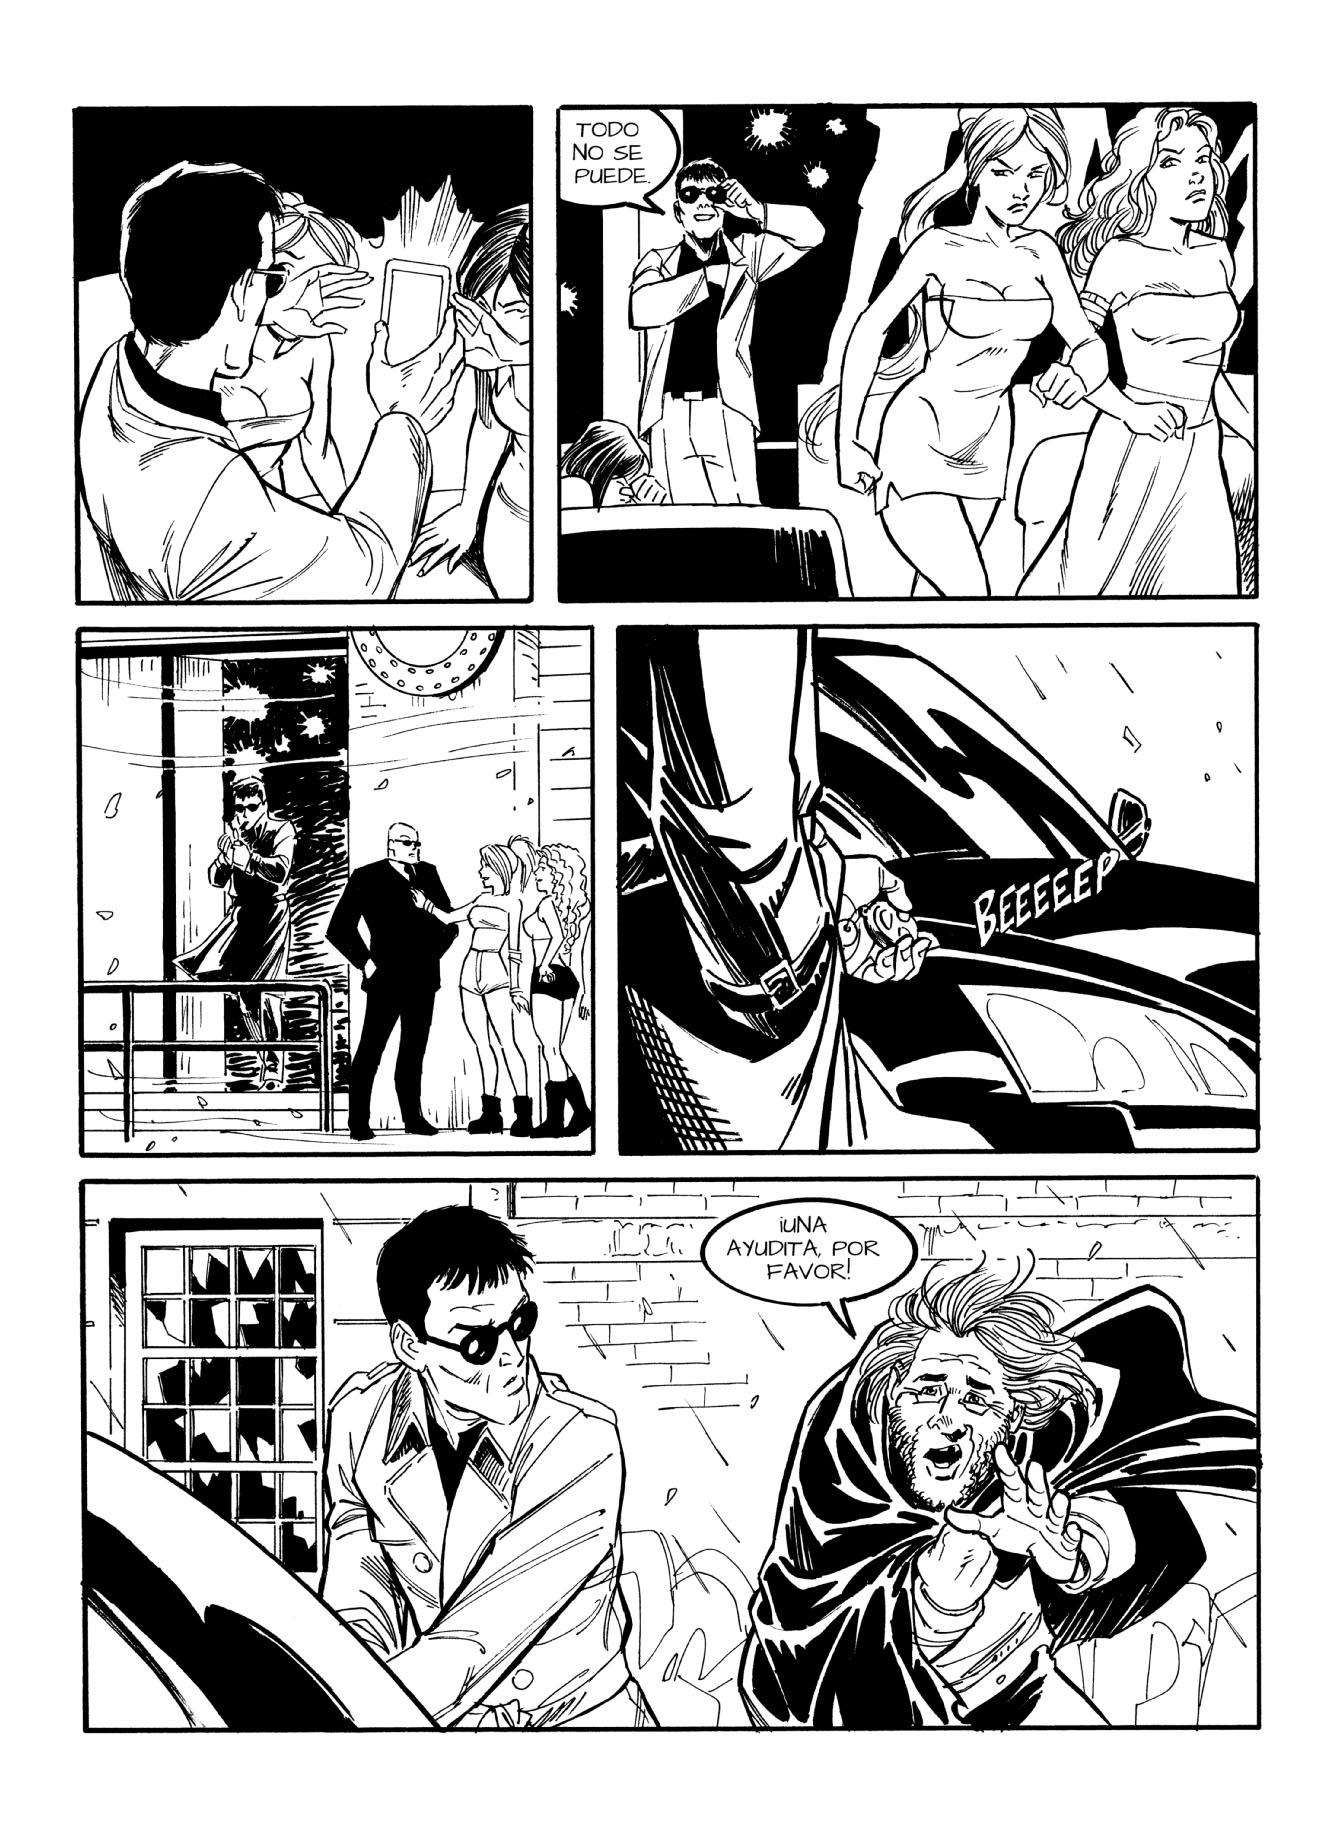 SpectrumWarriors-issue-01-page-05